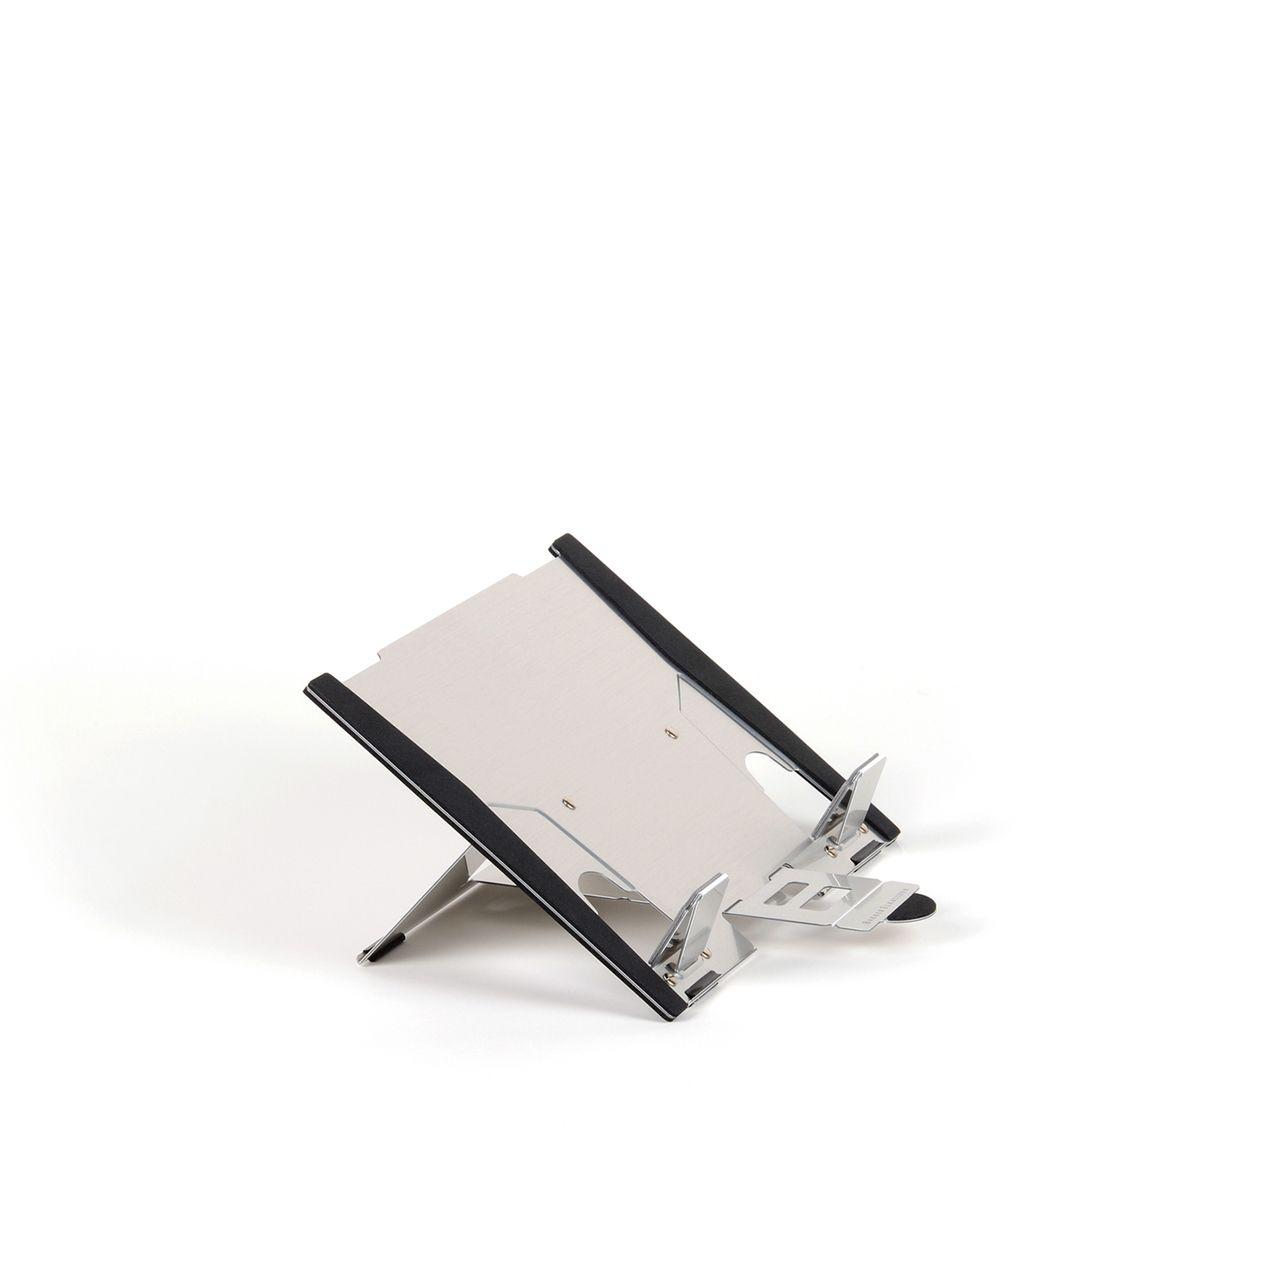 flextop mini laptophouder ERKAFTO31 uitgeklapt